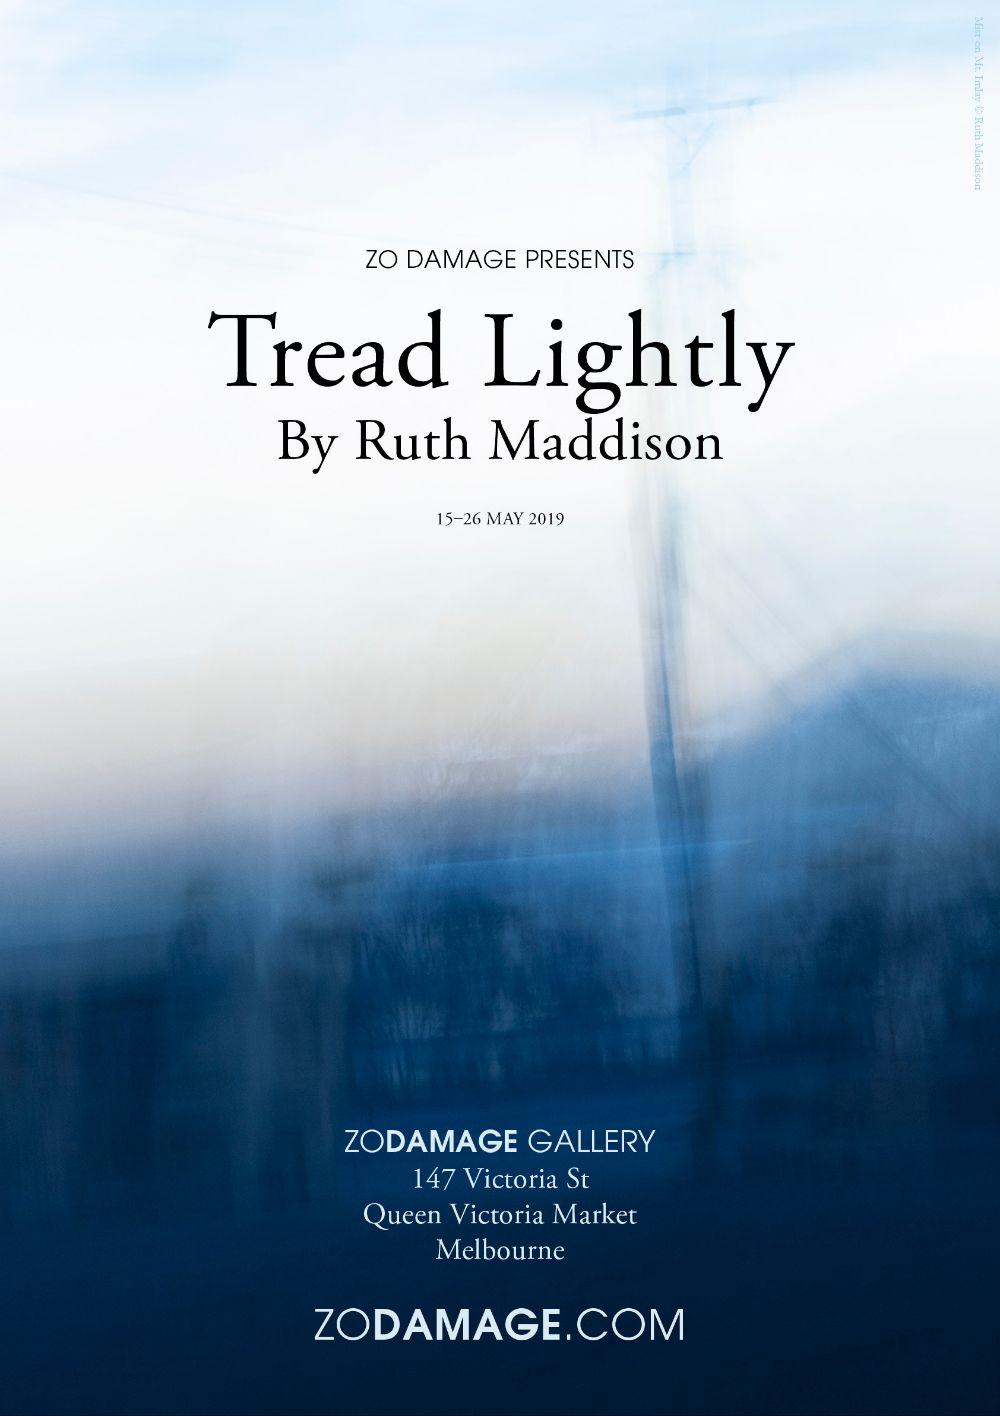 Ruth Maddison – Zo Damage guest artist